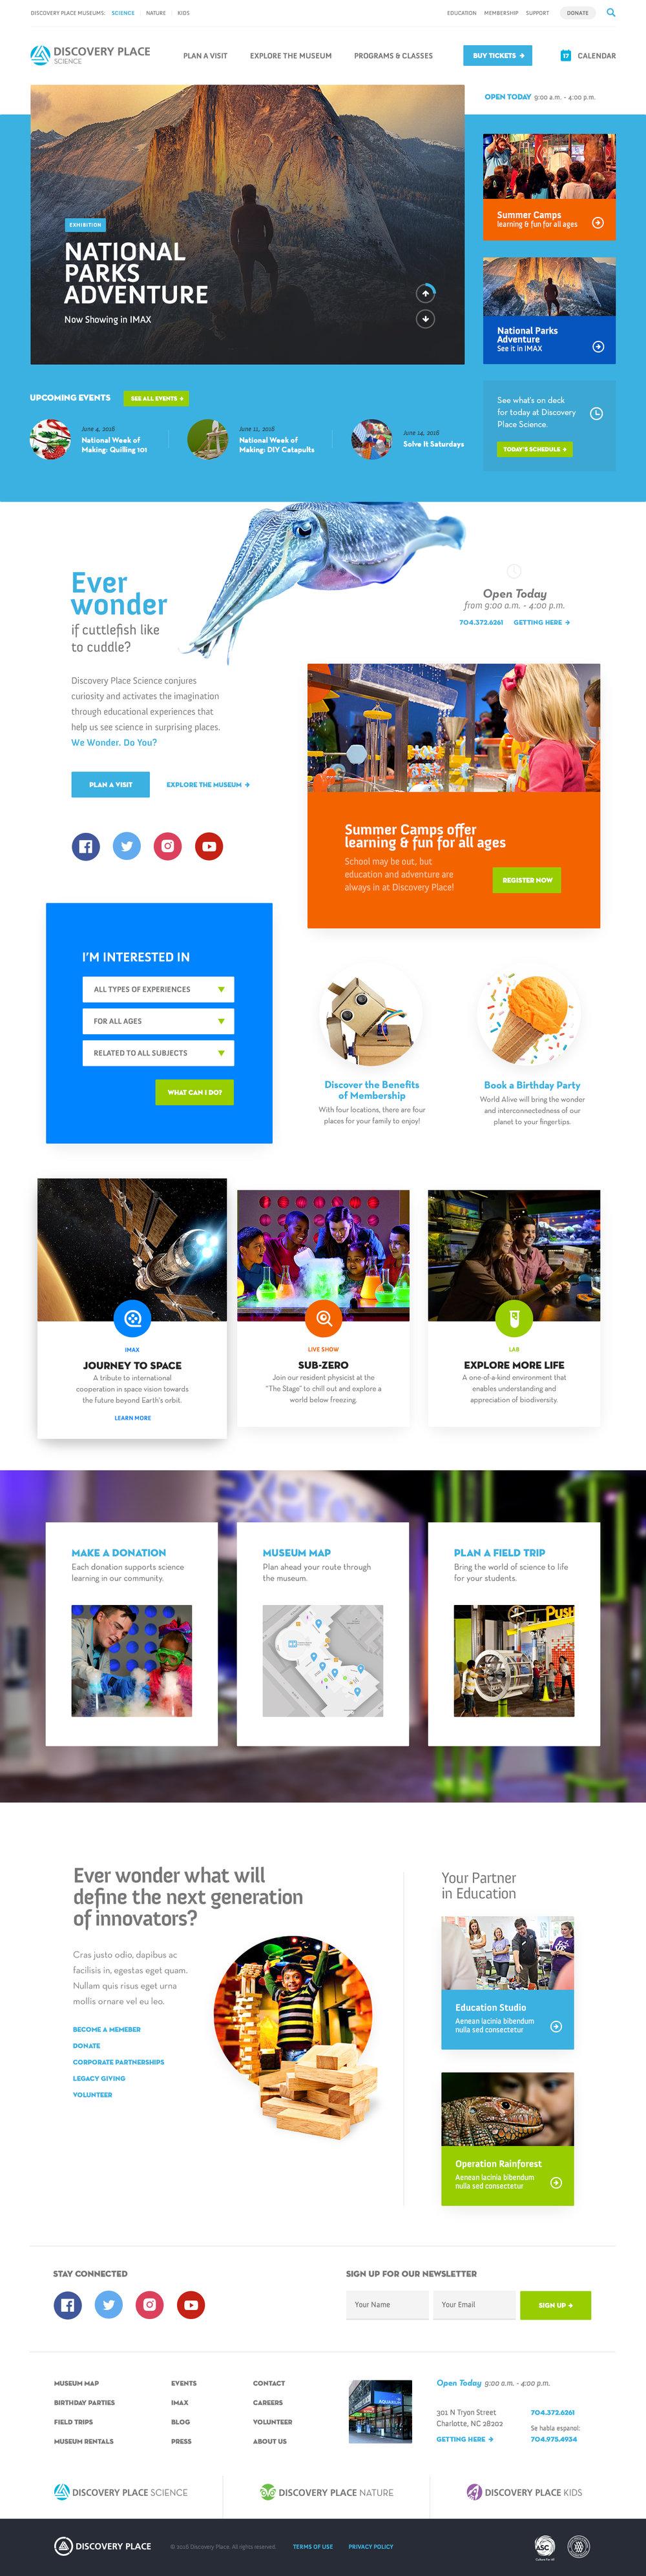 1_dps-homepage-callouts-imaxhover.jpg